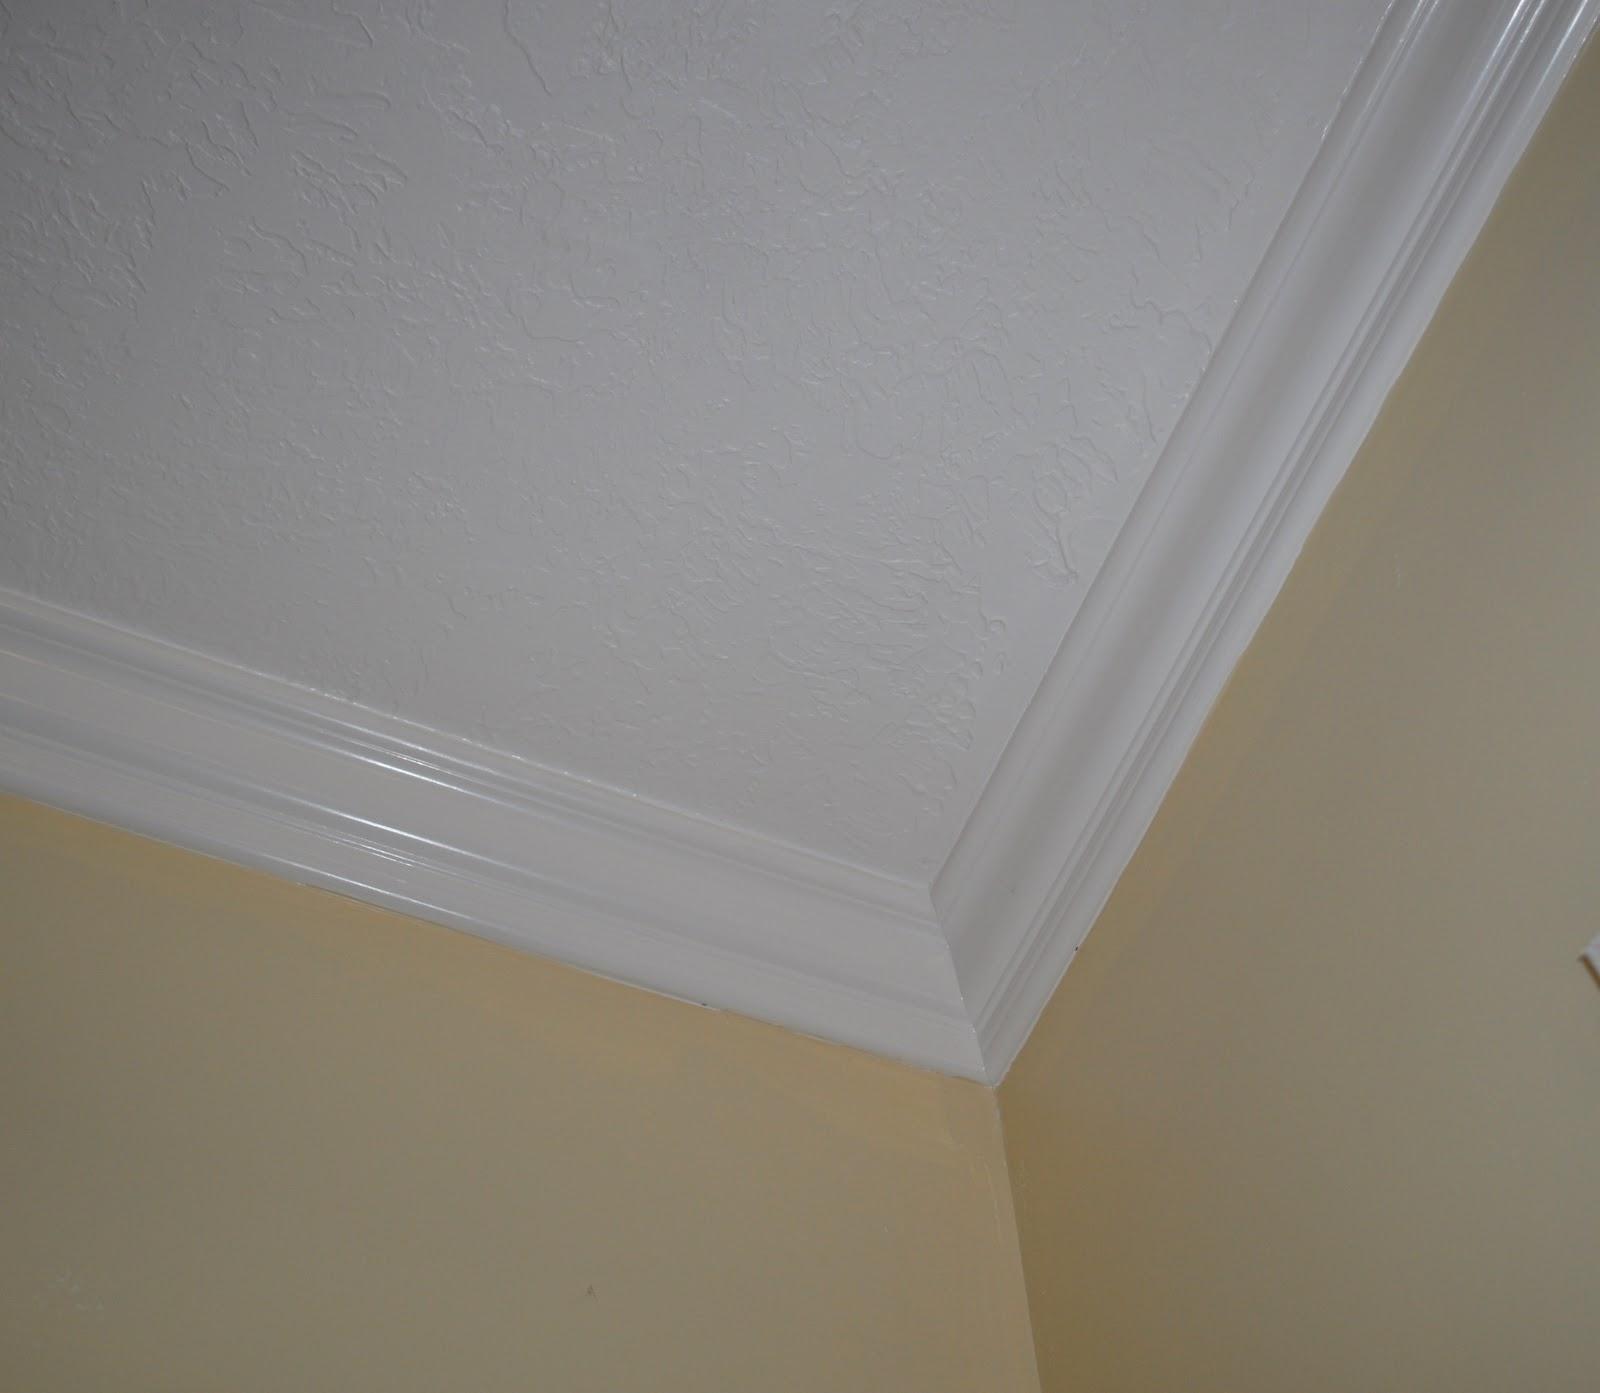 paint ideas for popcorn ceiling - La Vie Quoti nne A Notch Up the ceiling